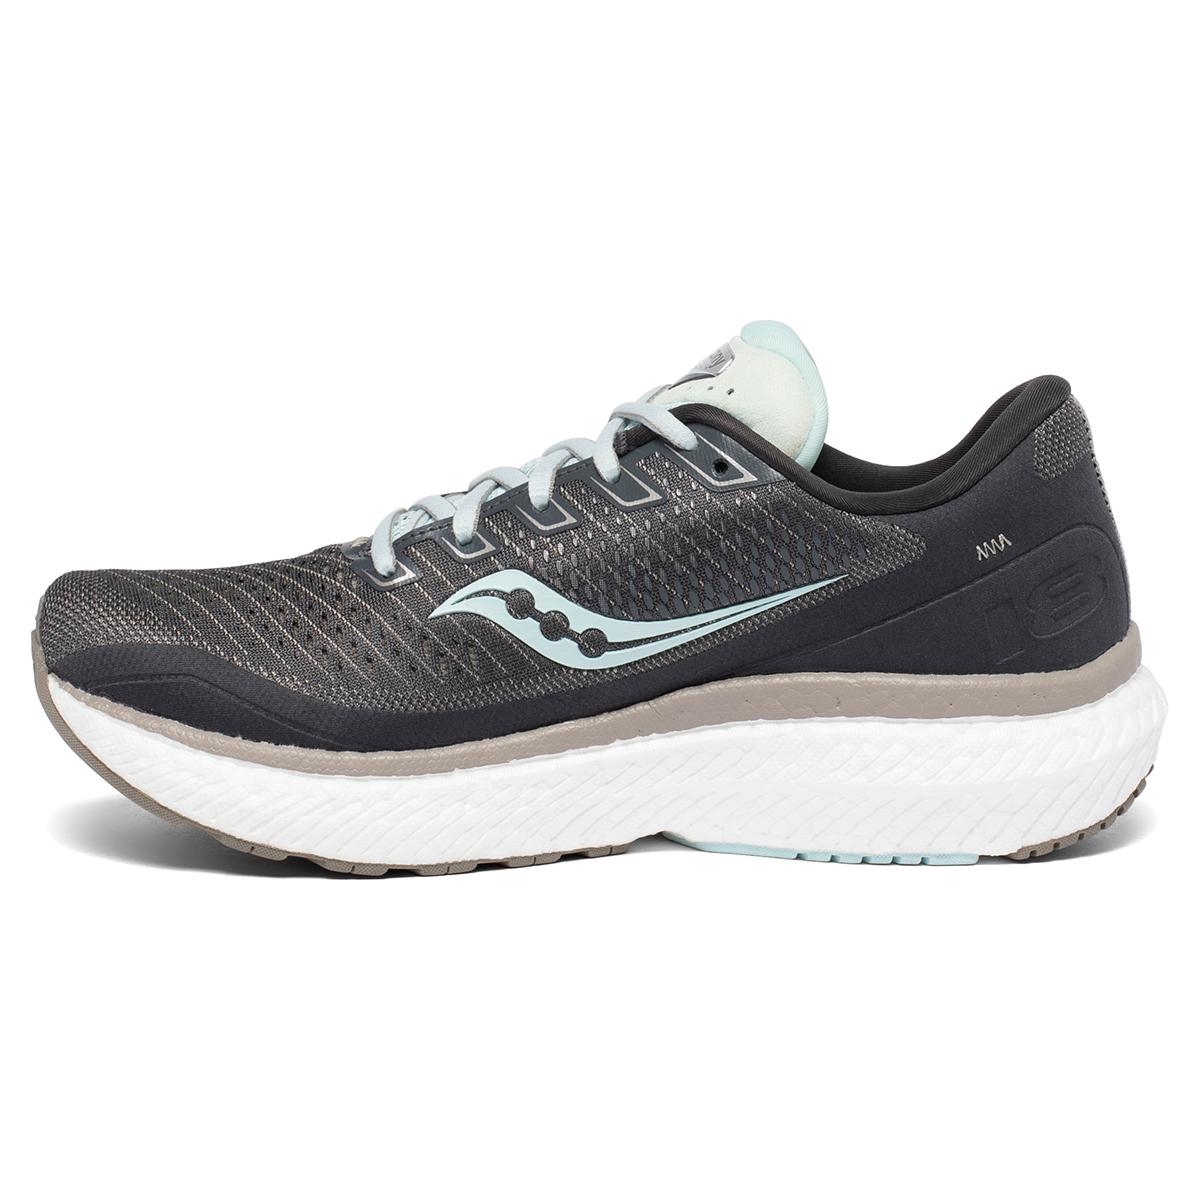 Women's Saucony Triumph 18 Running Shoe, , large, image 5